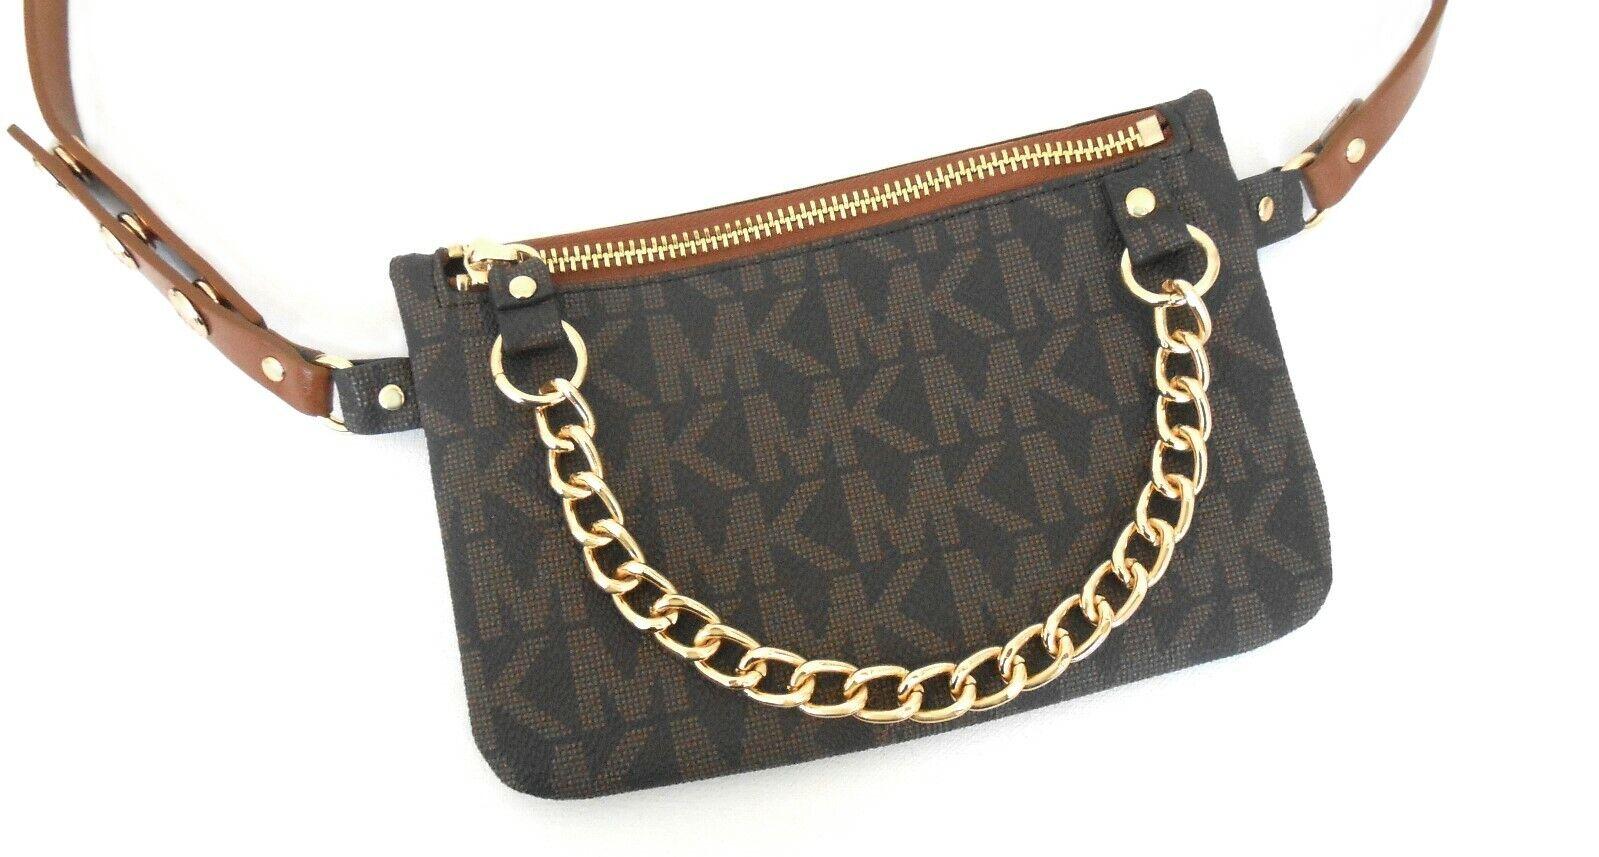 269e23e6eebd Michael Kors MK Logo Chocolate Brown Fanny Pack Belt Bag 554131 Size ...